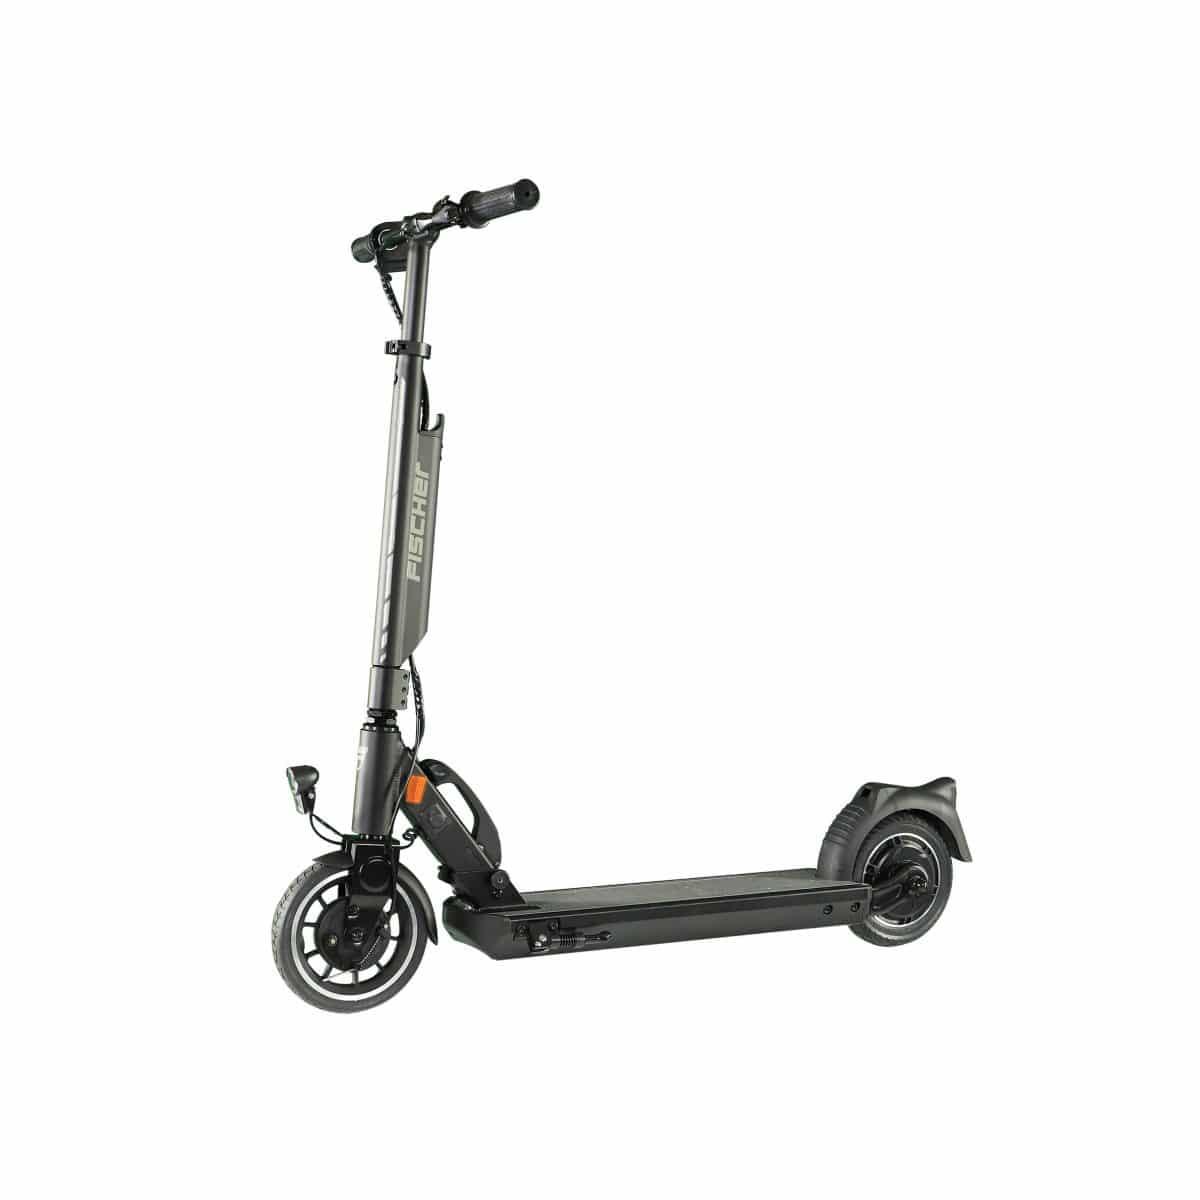 FISCHER E-Scooter ioco 1.0i